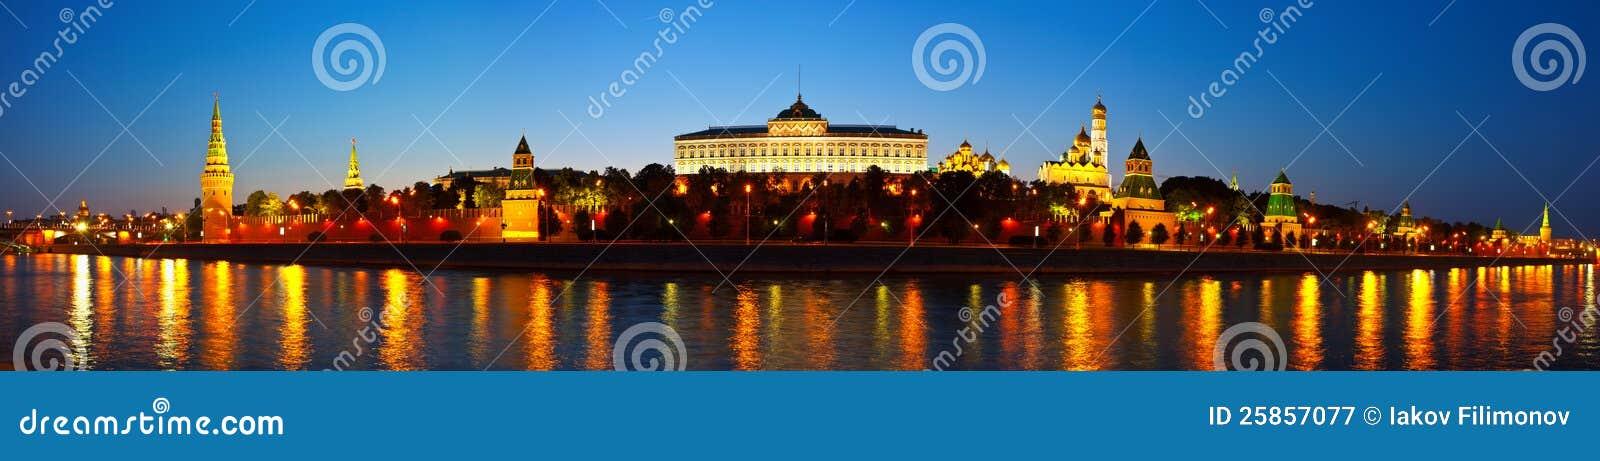 Panorama Moskwa Kremlin w noc. Rosja